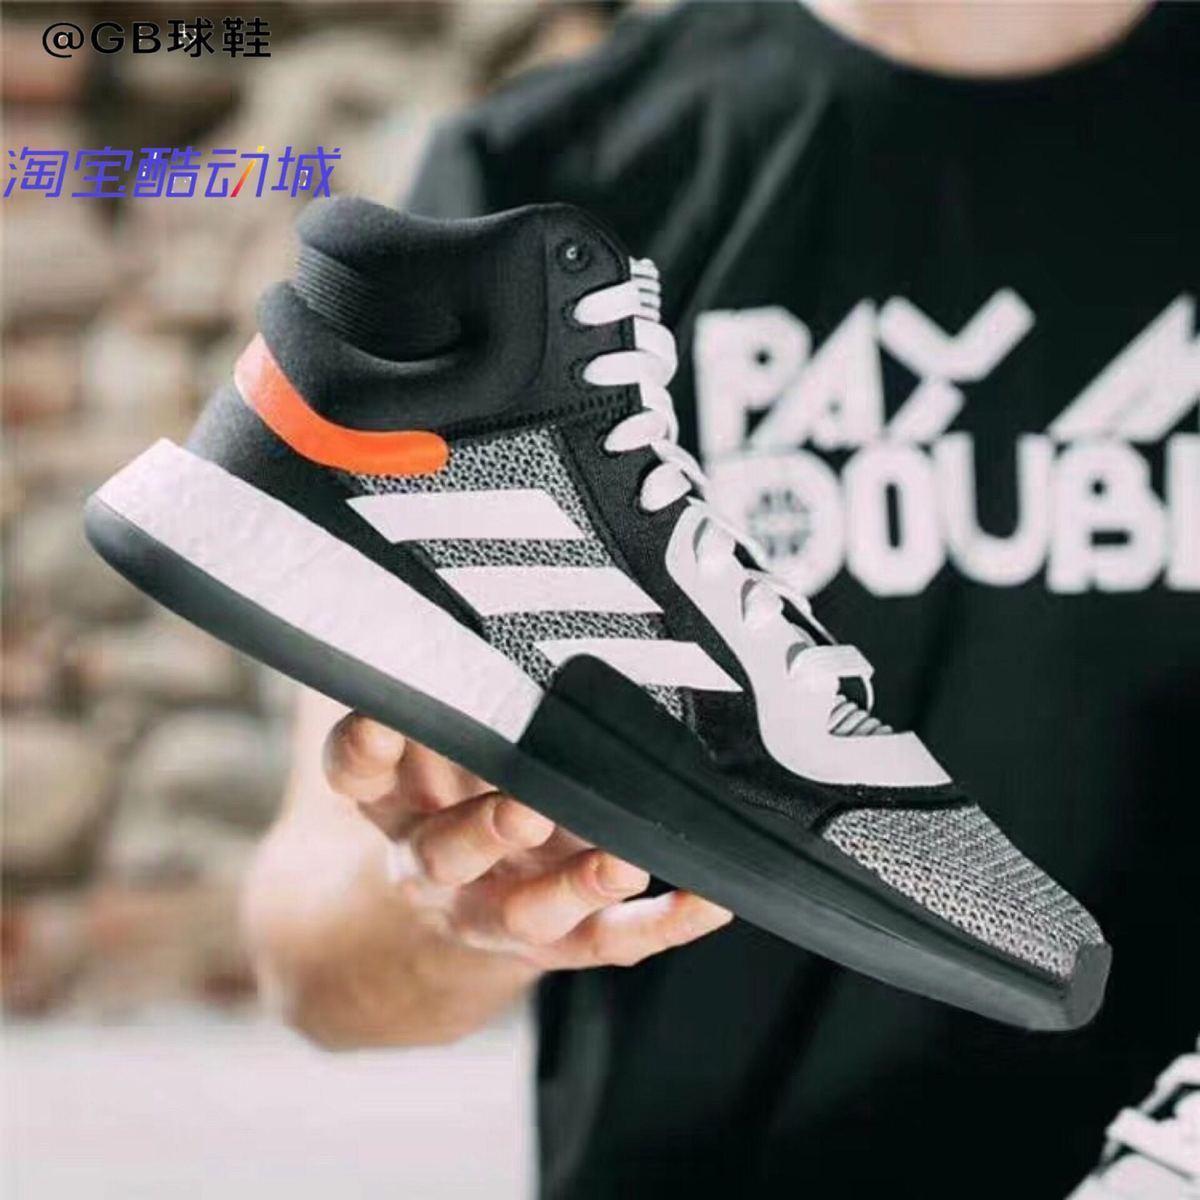 Adidas Marquee Boost 沃尔篮球鞋 G26212 G27746 G28978 G27736